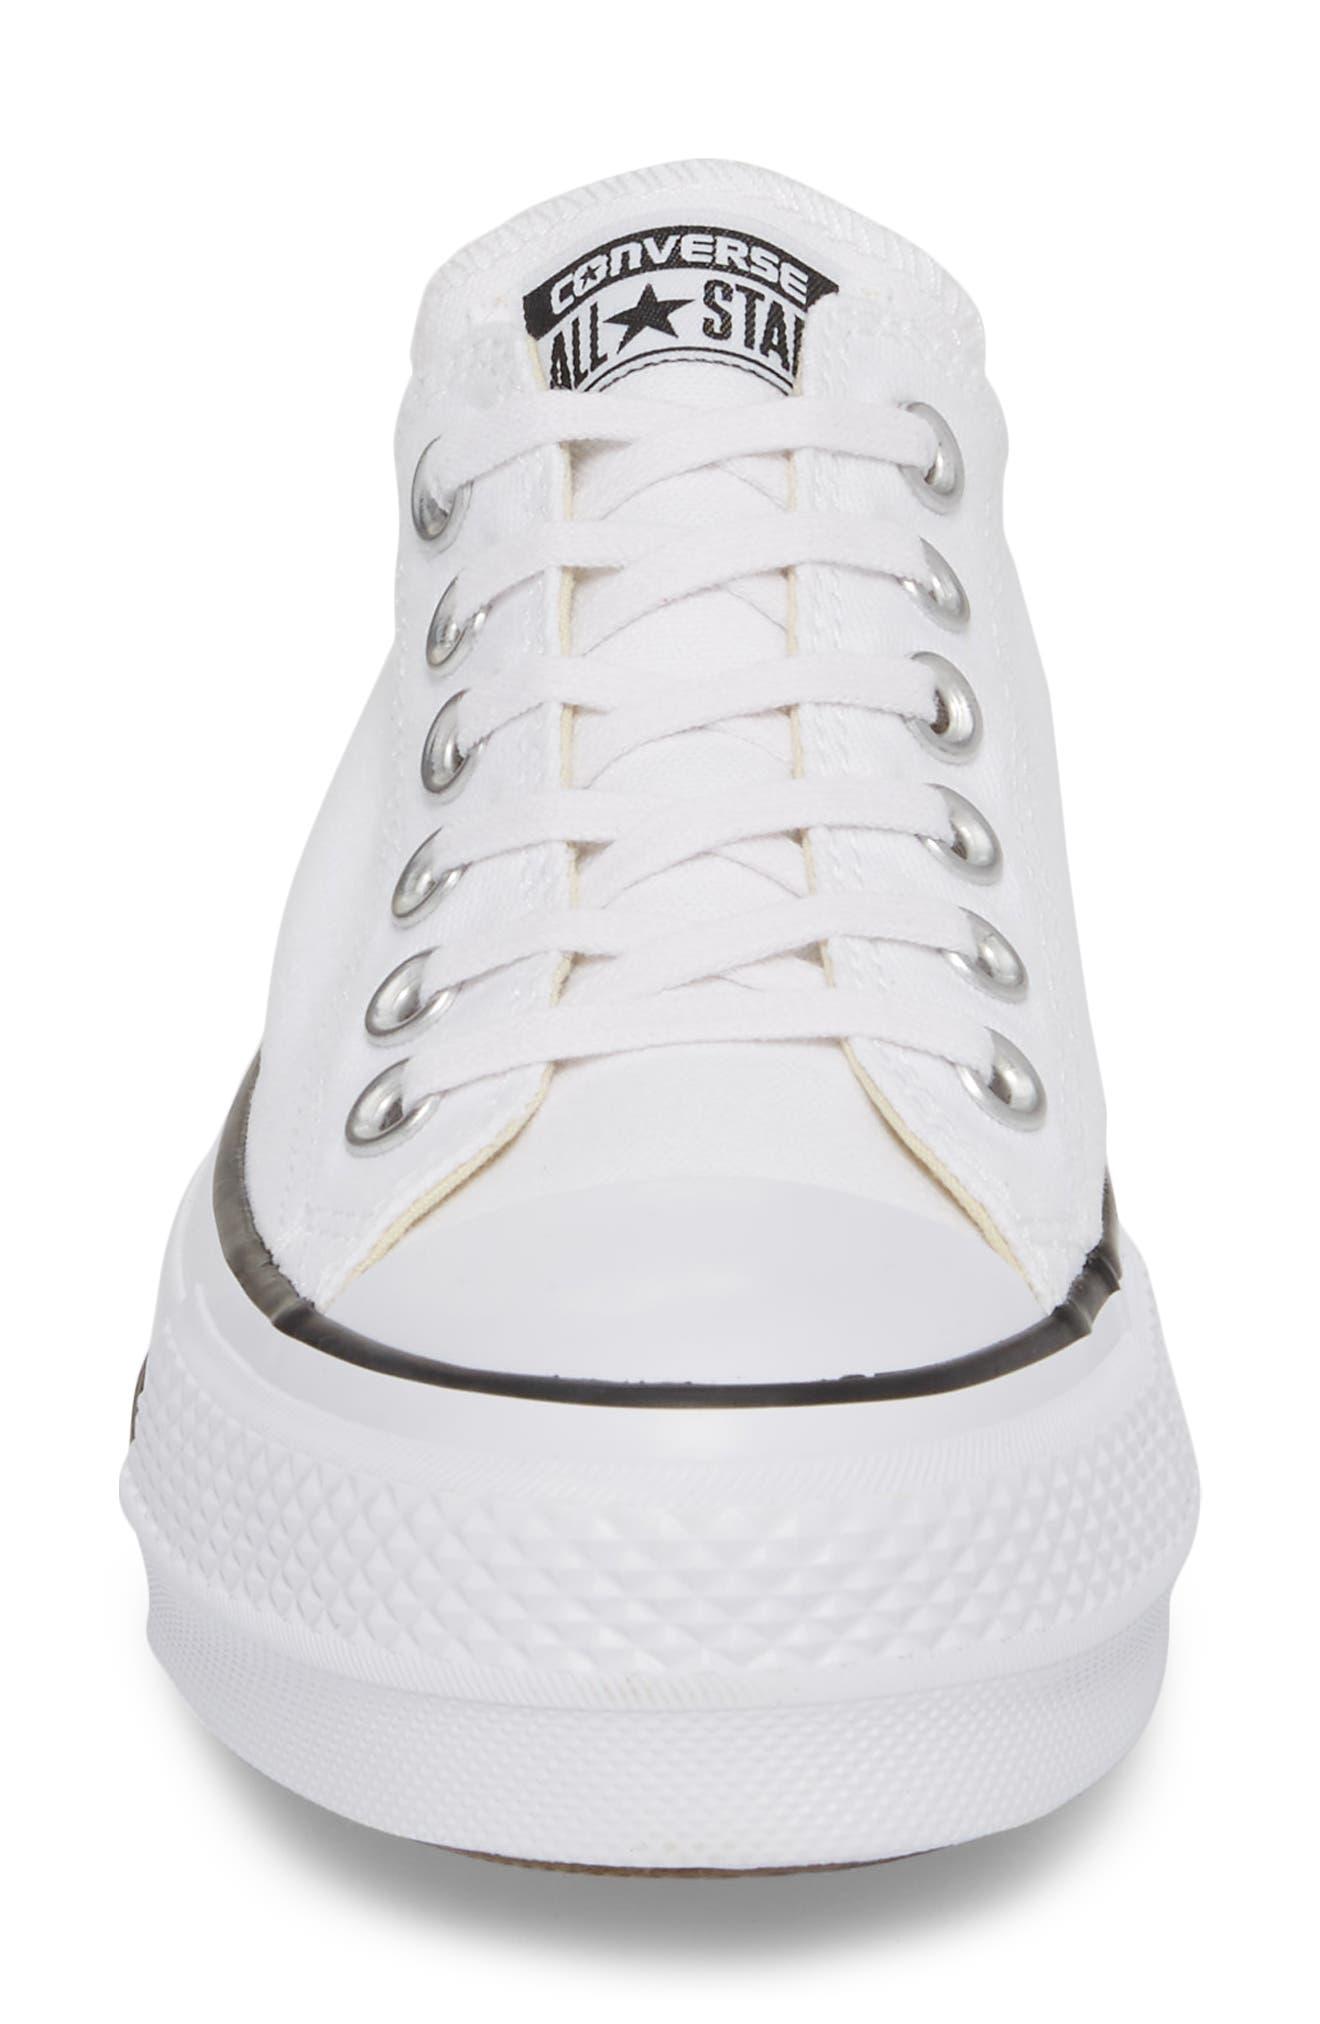 Chuck Taylor<sup>®</sup> All Star<sup>®</sup> Platform Sneaker,                             Alternate thumbnail 4, color,                             White/ Black/ White